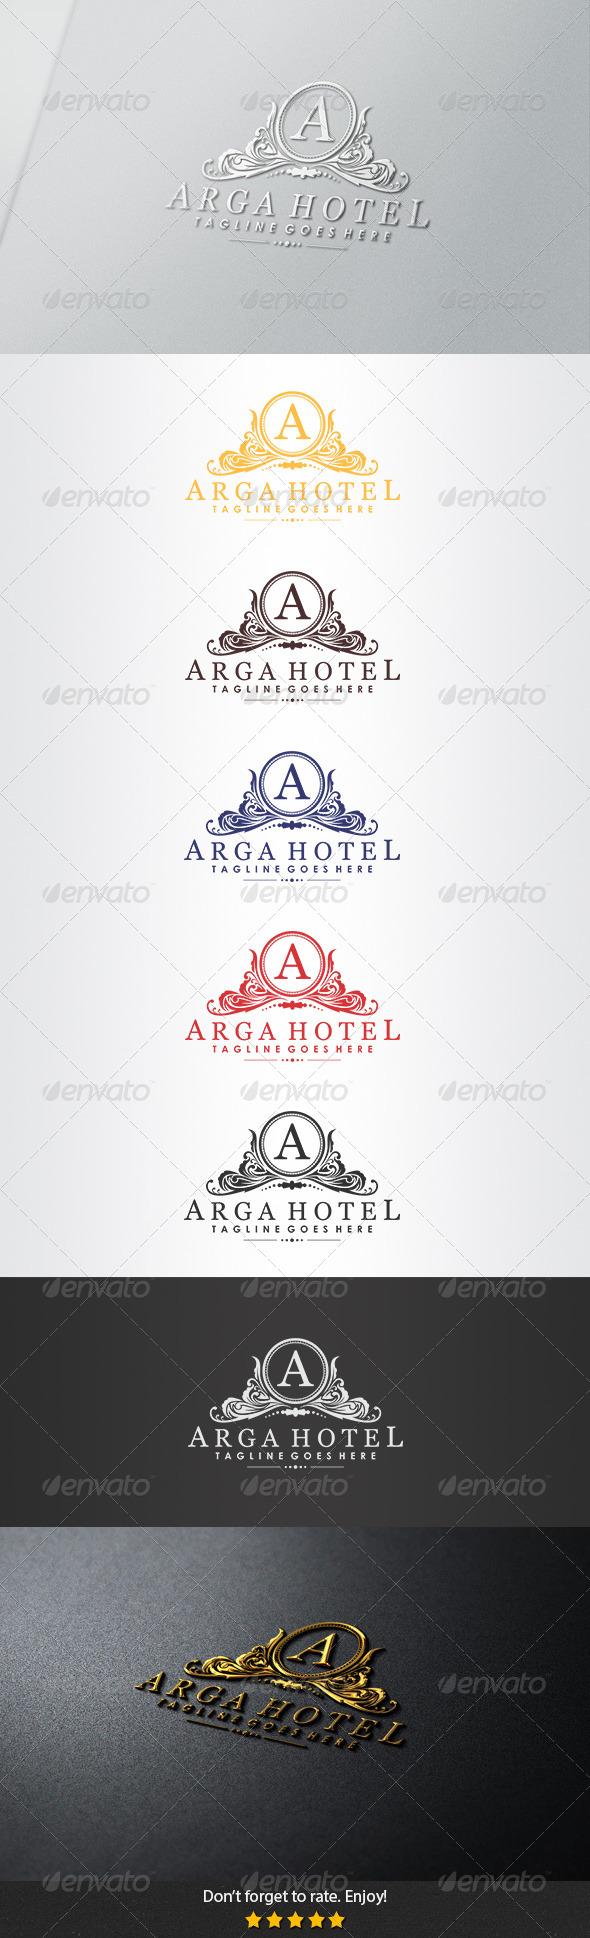 Arga Hotel Logo - Crests Logo Templates